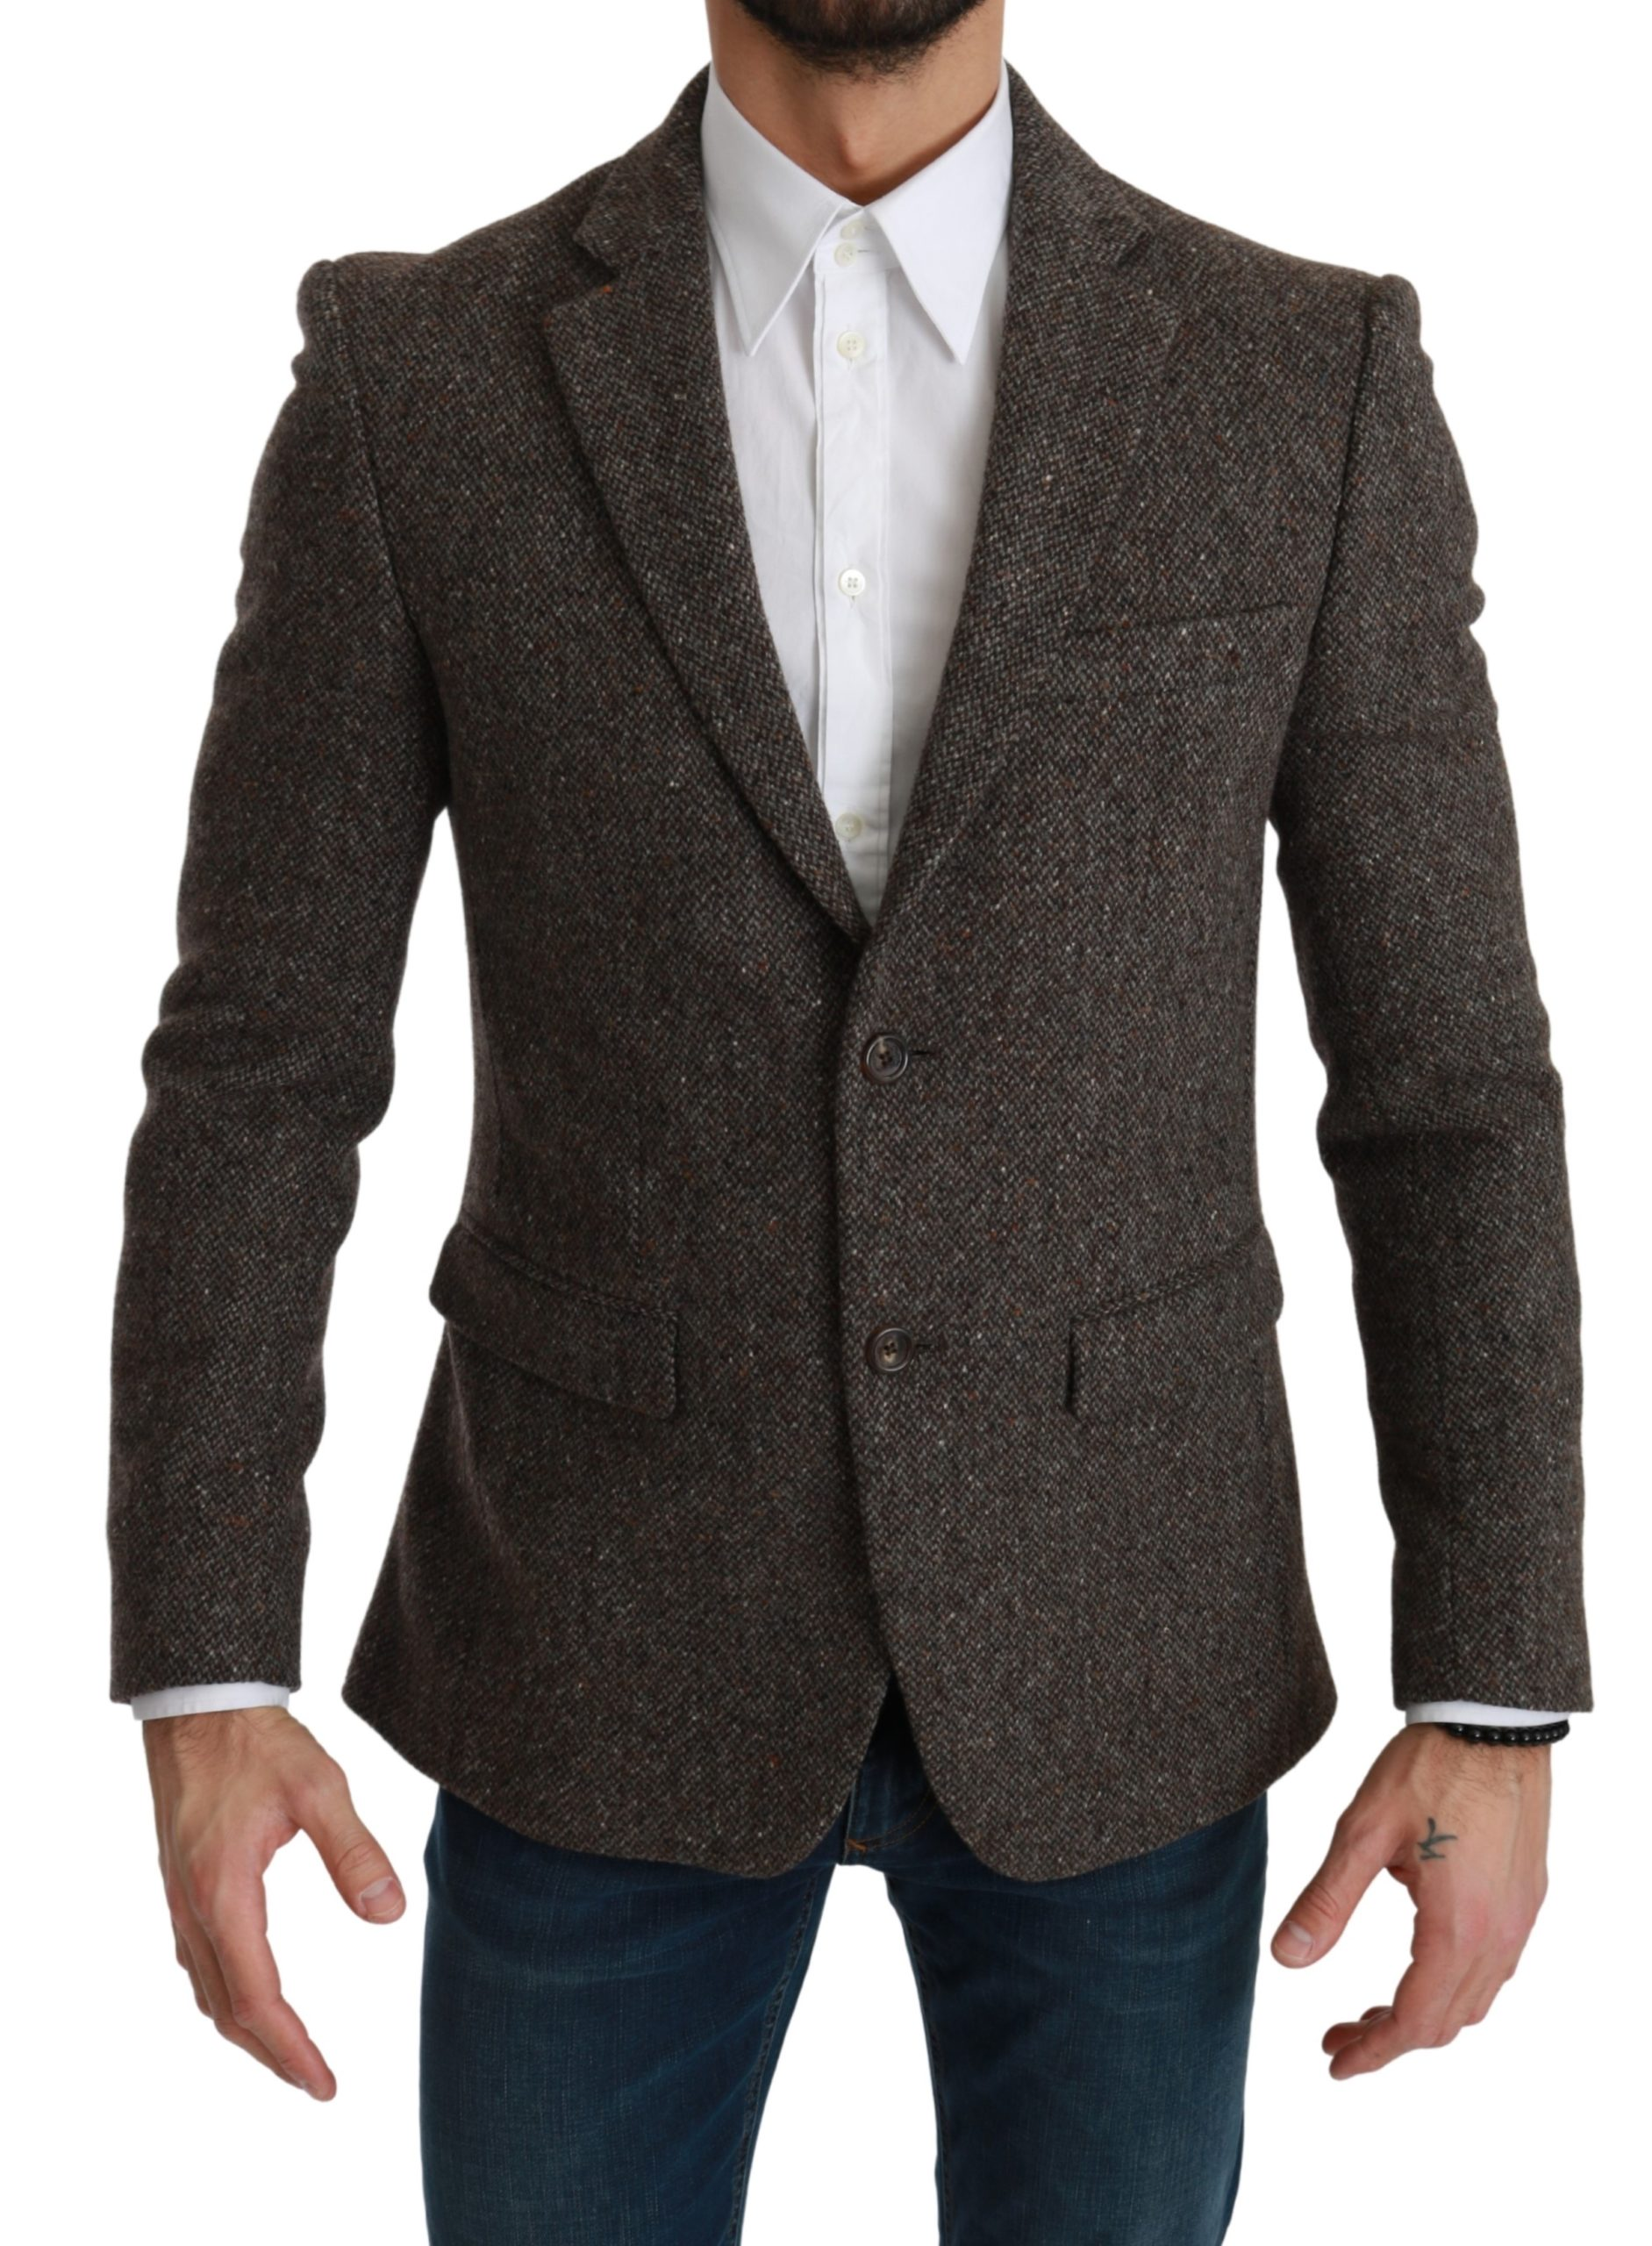 Dolce & Gabbana Men's Formal Coat Wool Blazer Brown KOS1783 - IT48 | M